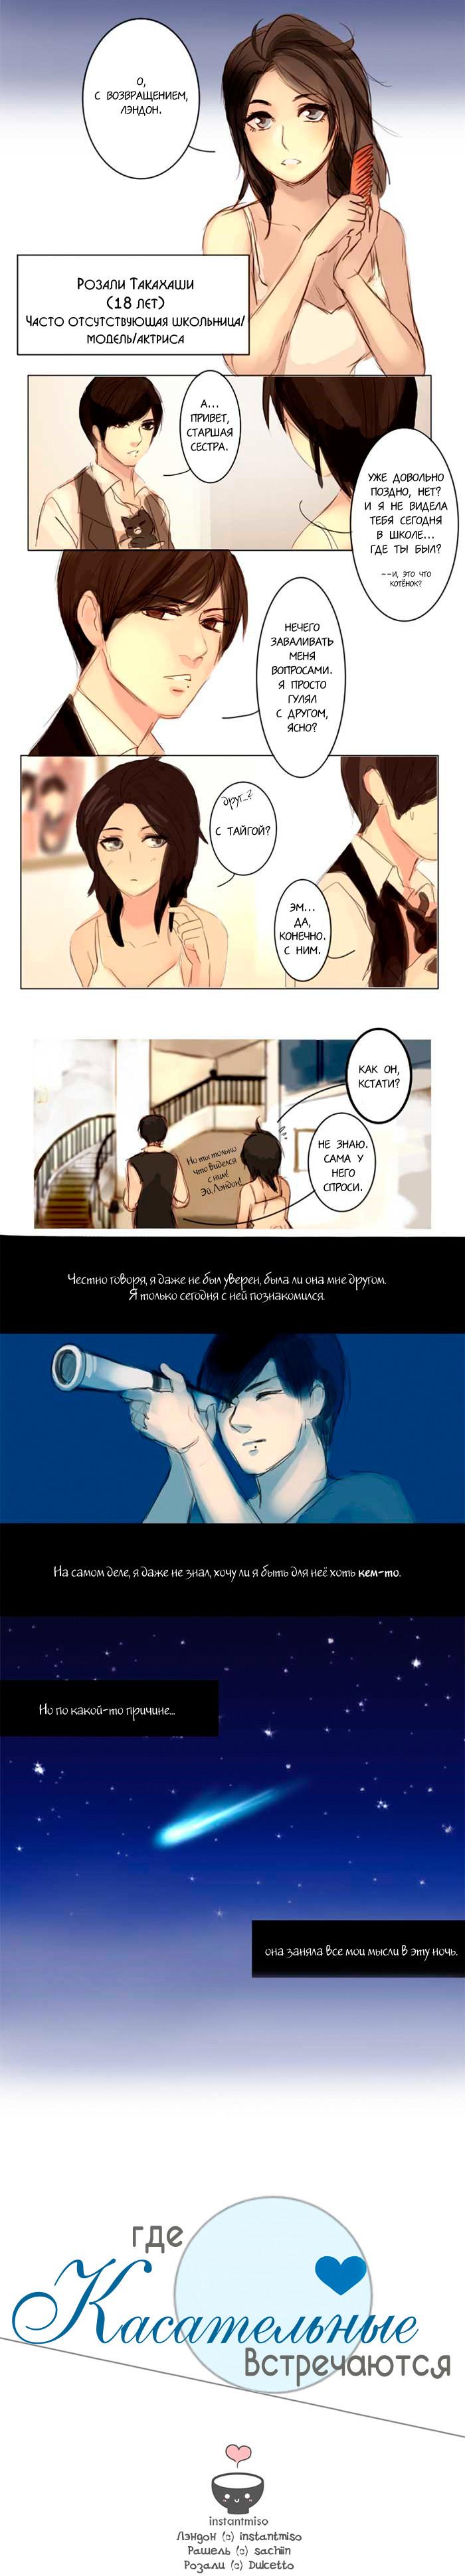 https://r1.ninemanga.com/comics/pic2/21/22485/241937/1431269188515.jpg Page 7